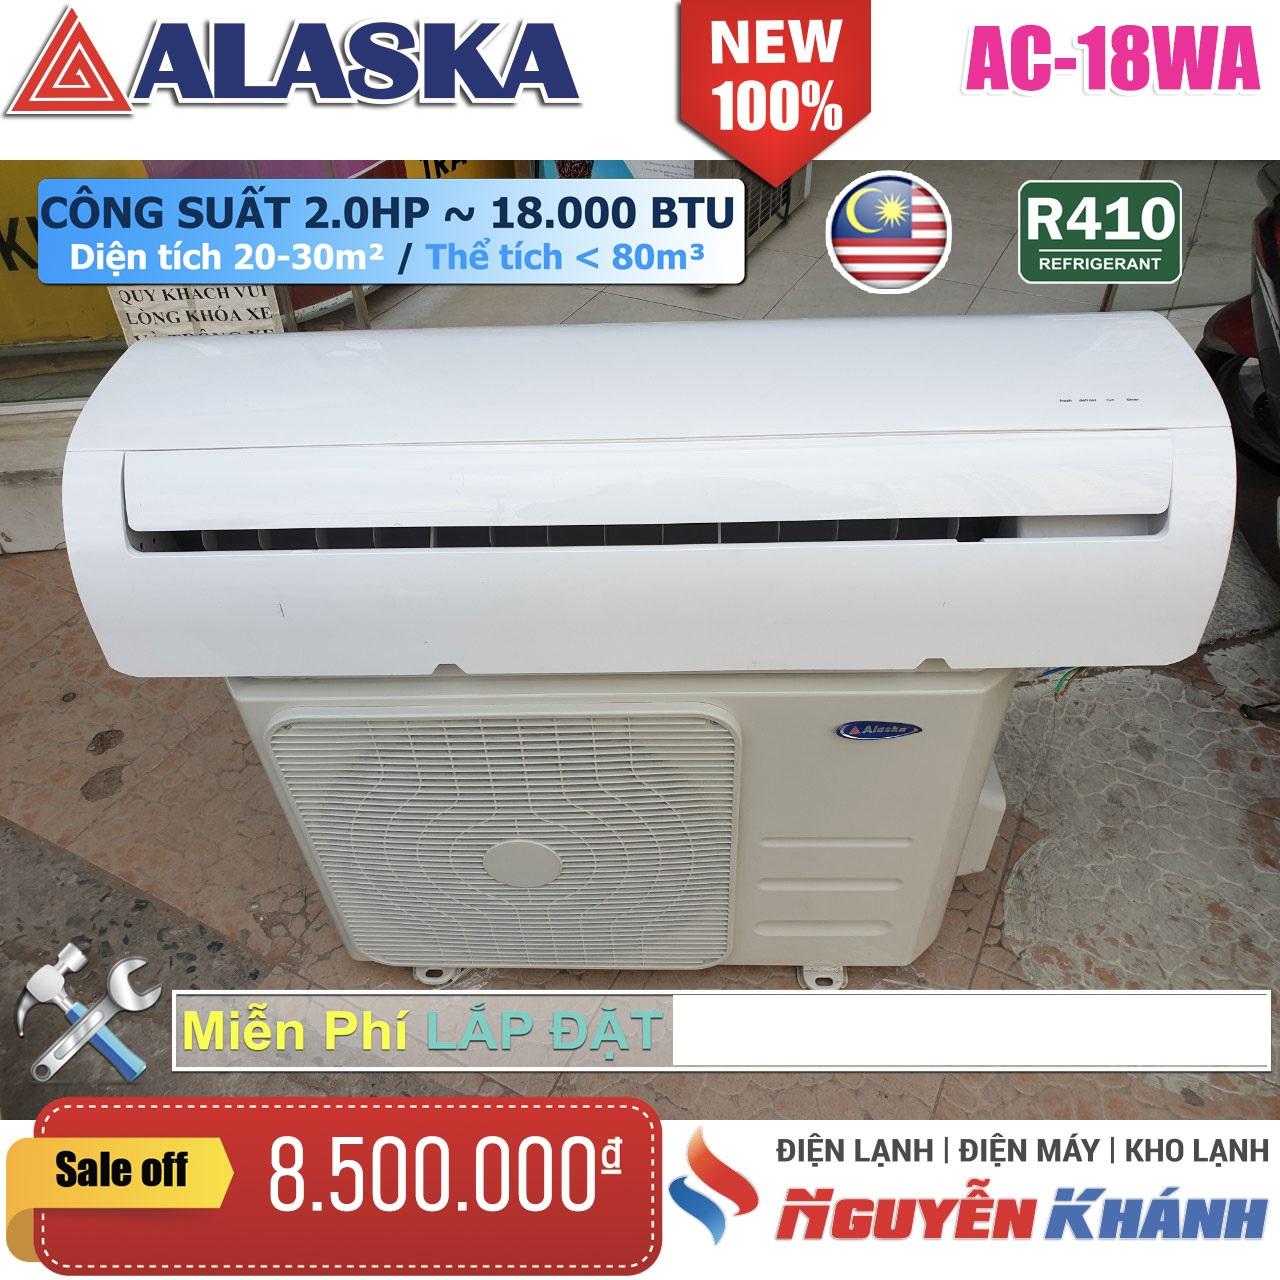 Máy lạnh Alaska AC-18WA (2.0Hp)